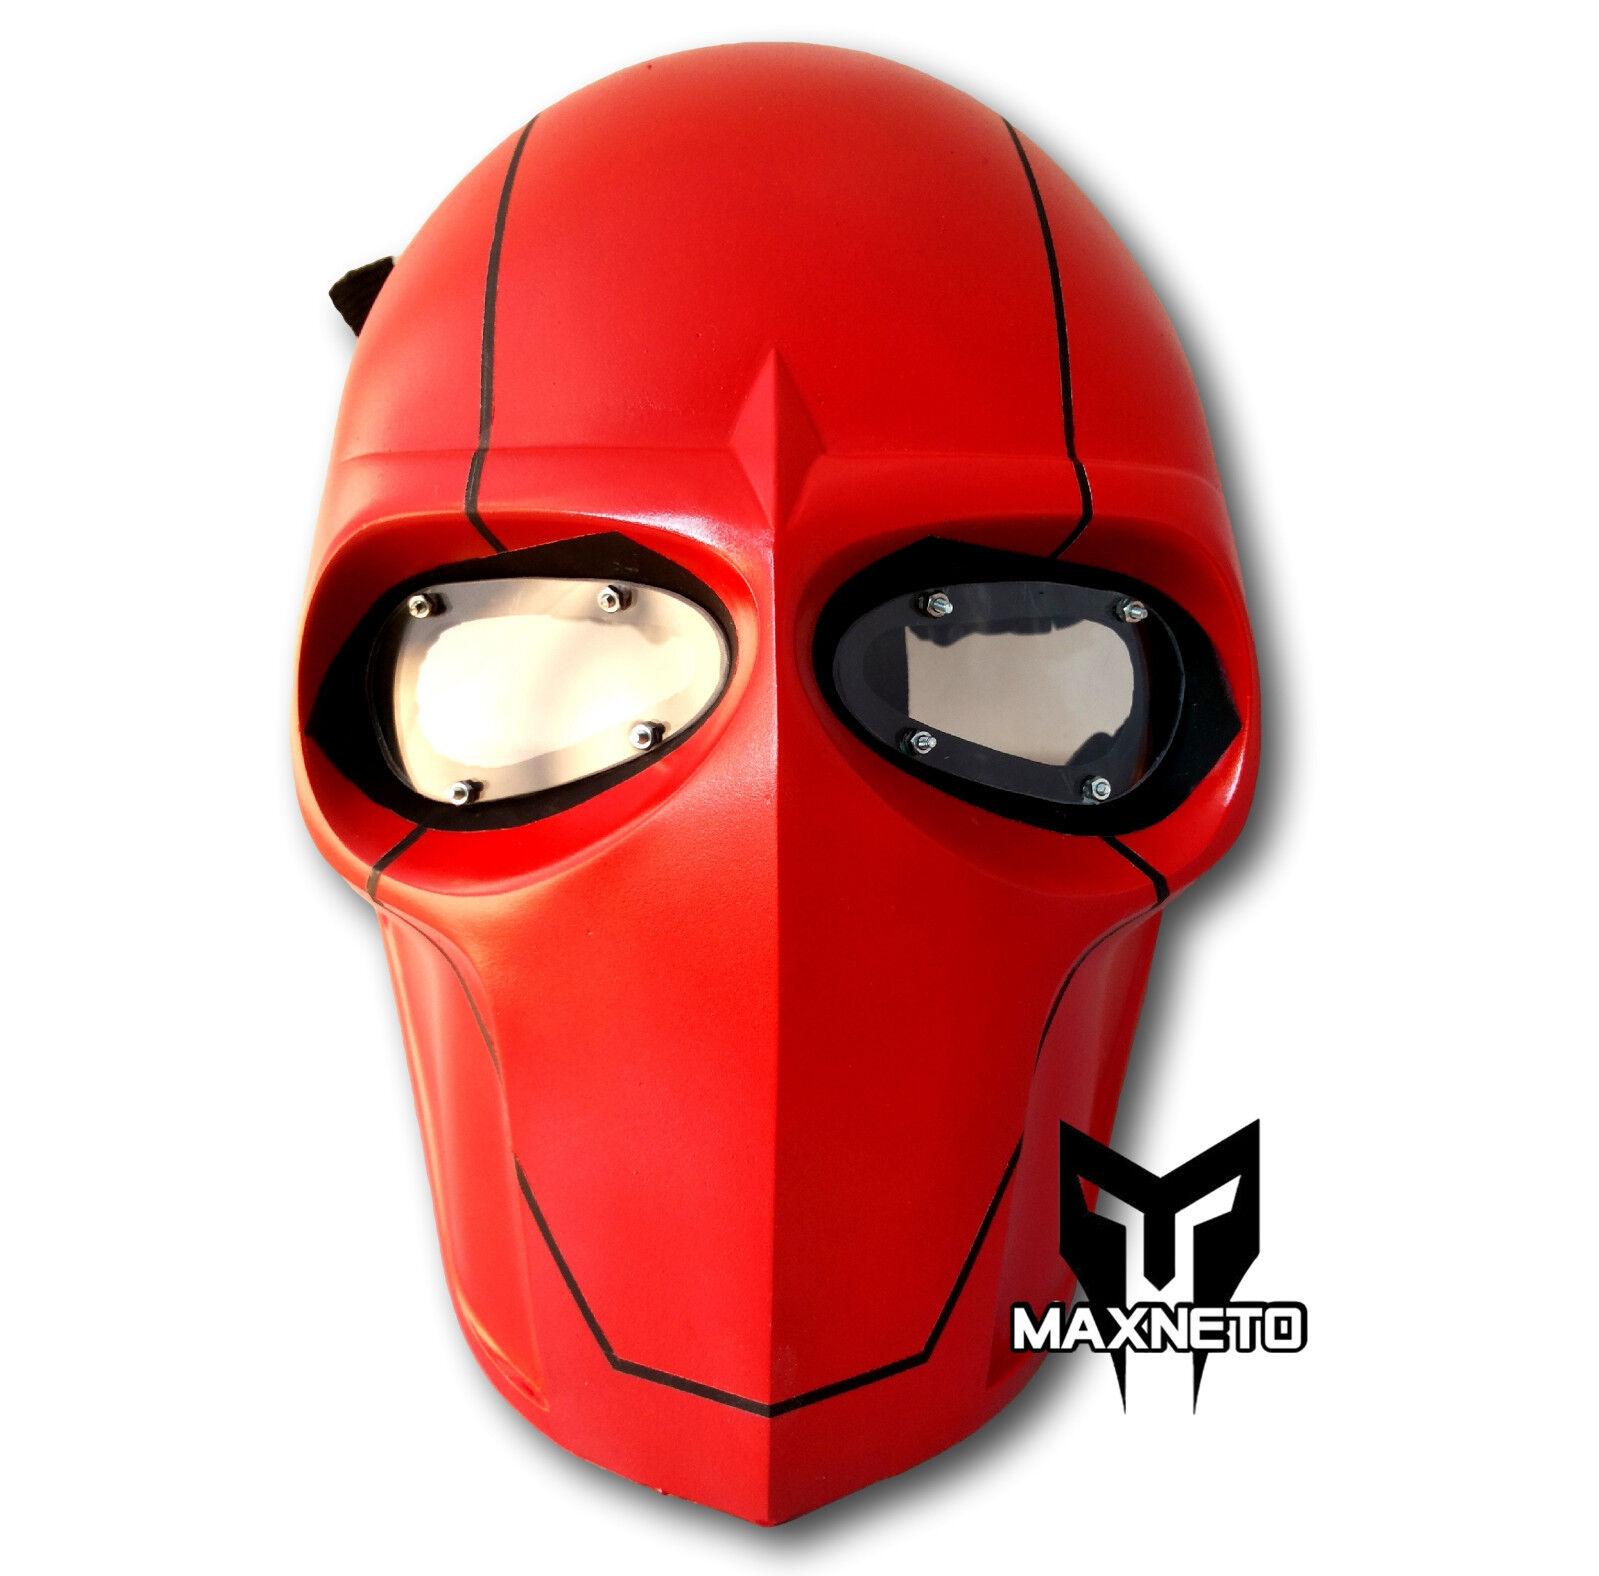 MAXNETO Airsoft Army of Two Paintball BB Gun Gun Gun Game Projoective Gear Mask rojo Hood db635d